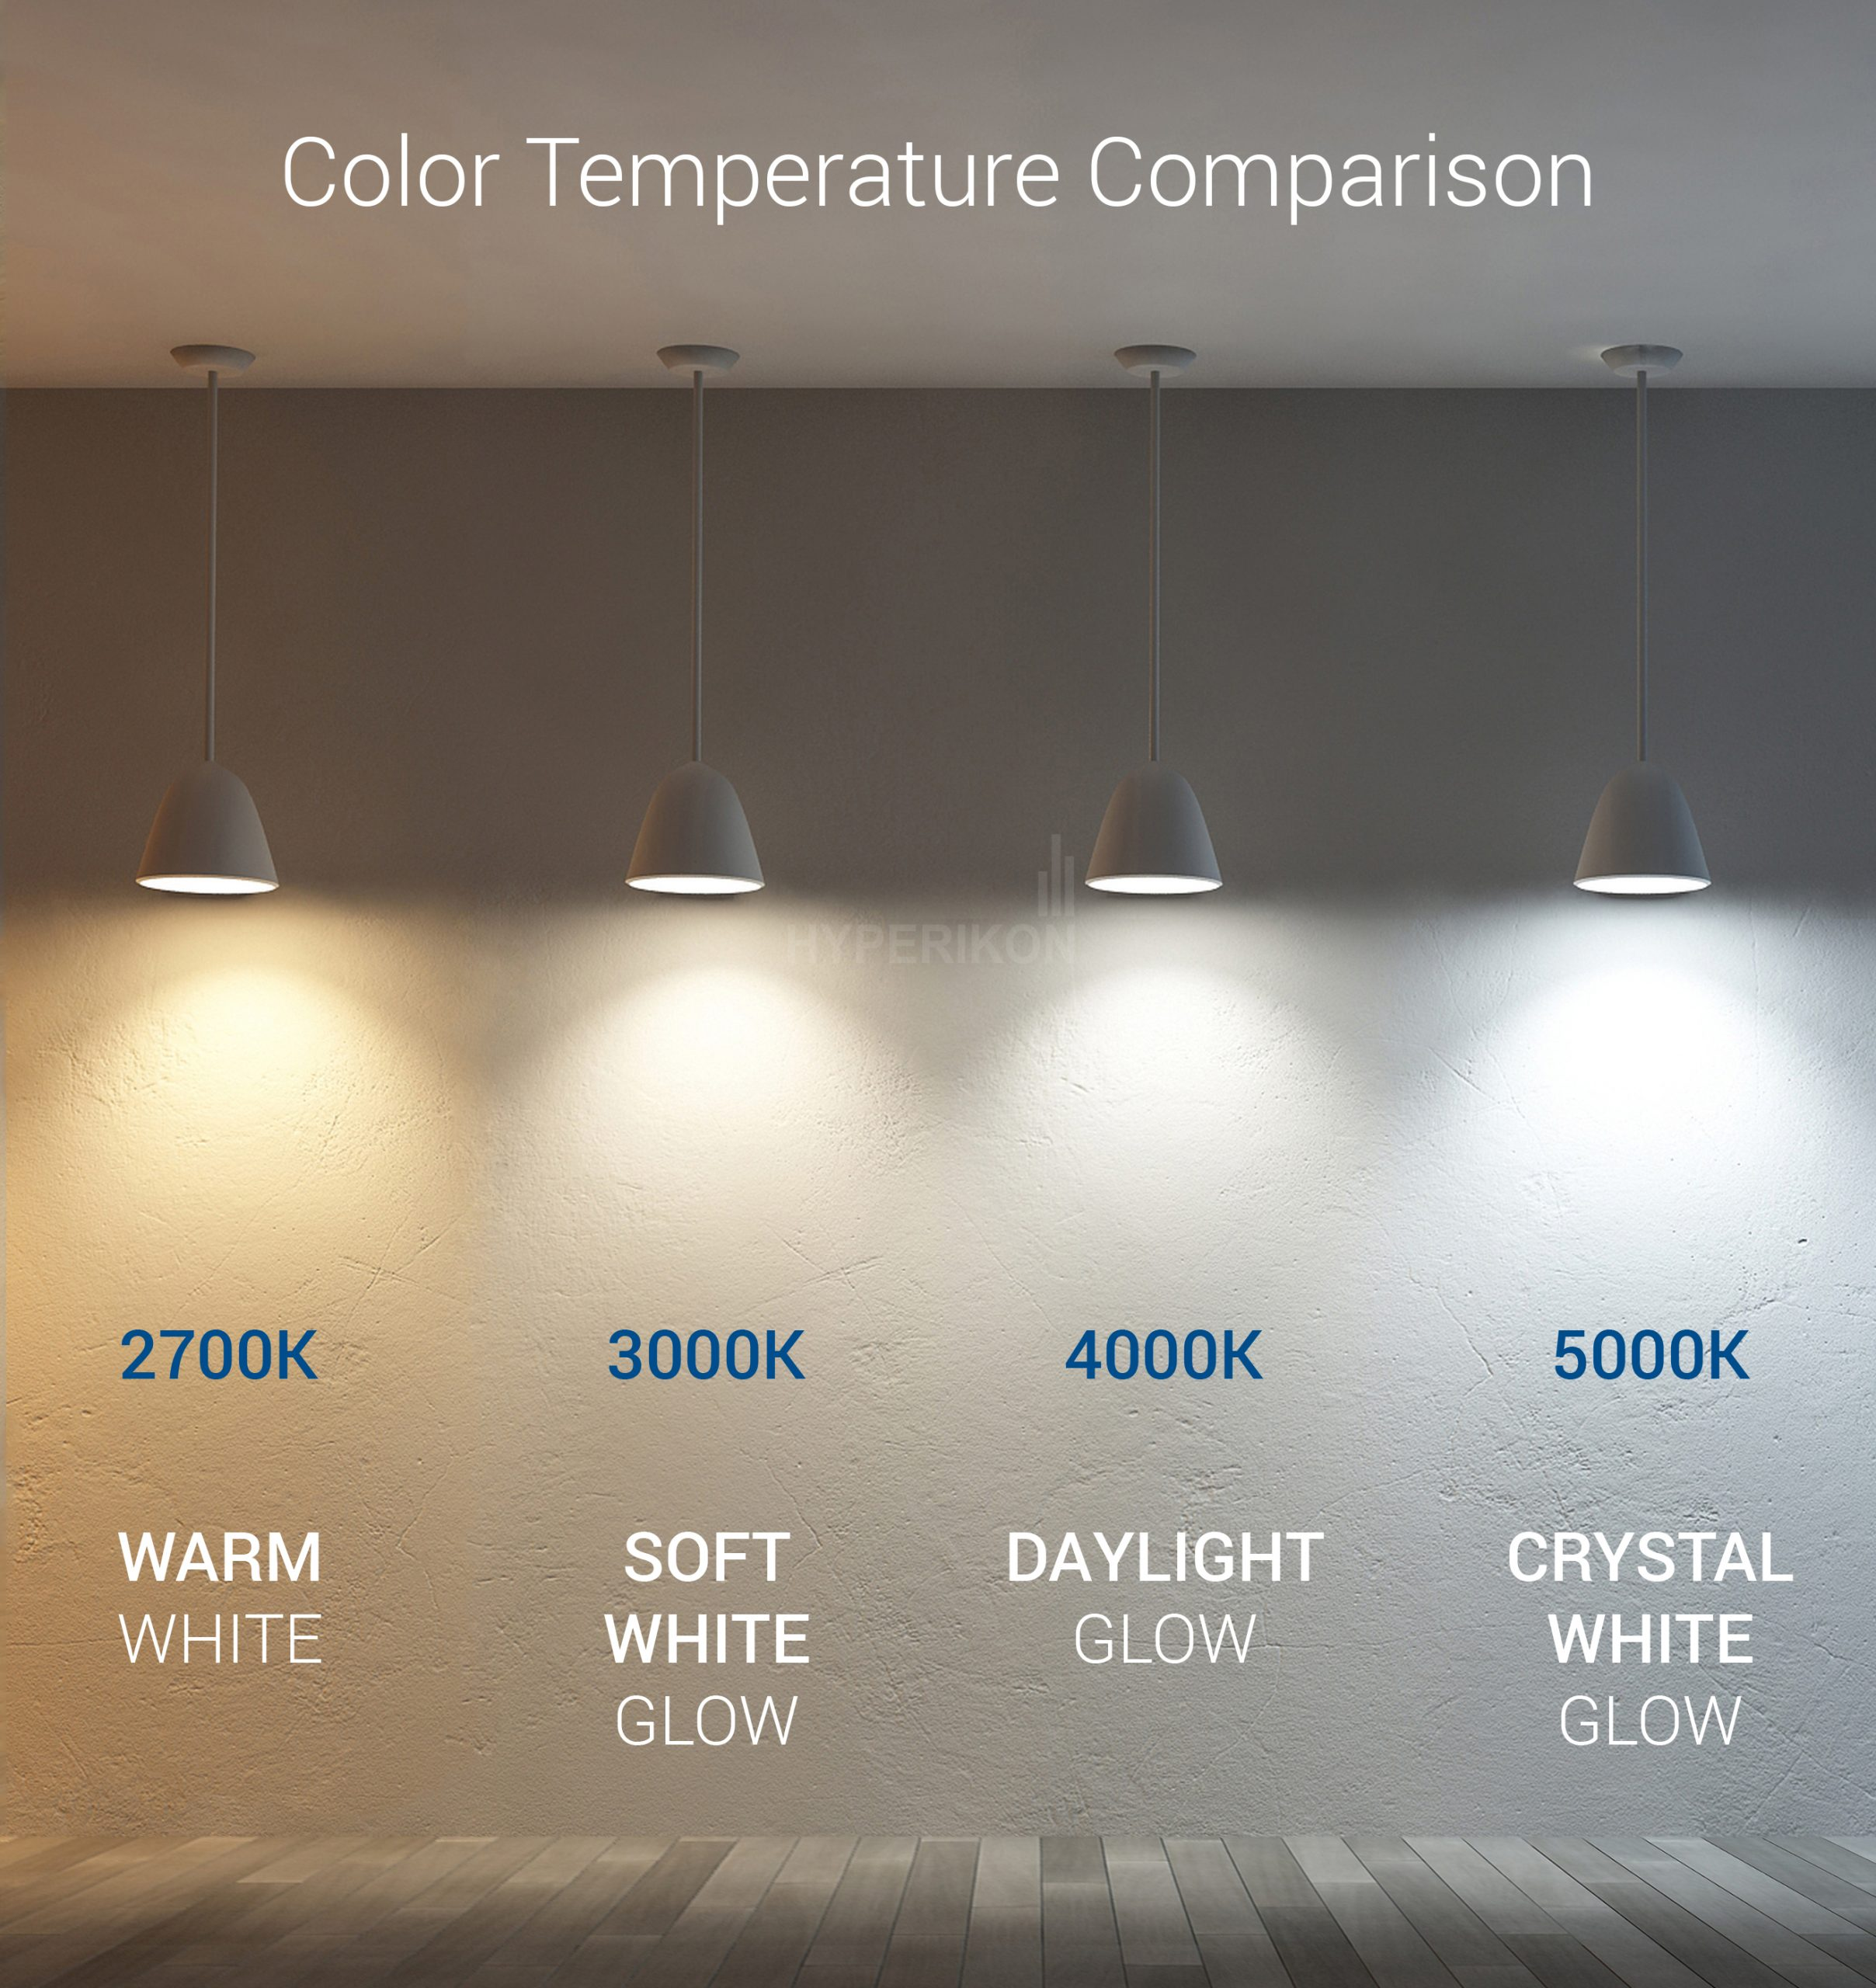 Ulike fargetemperaturer